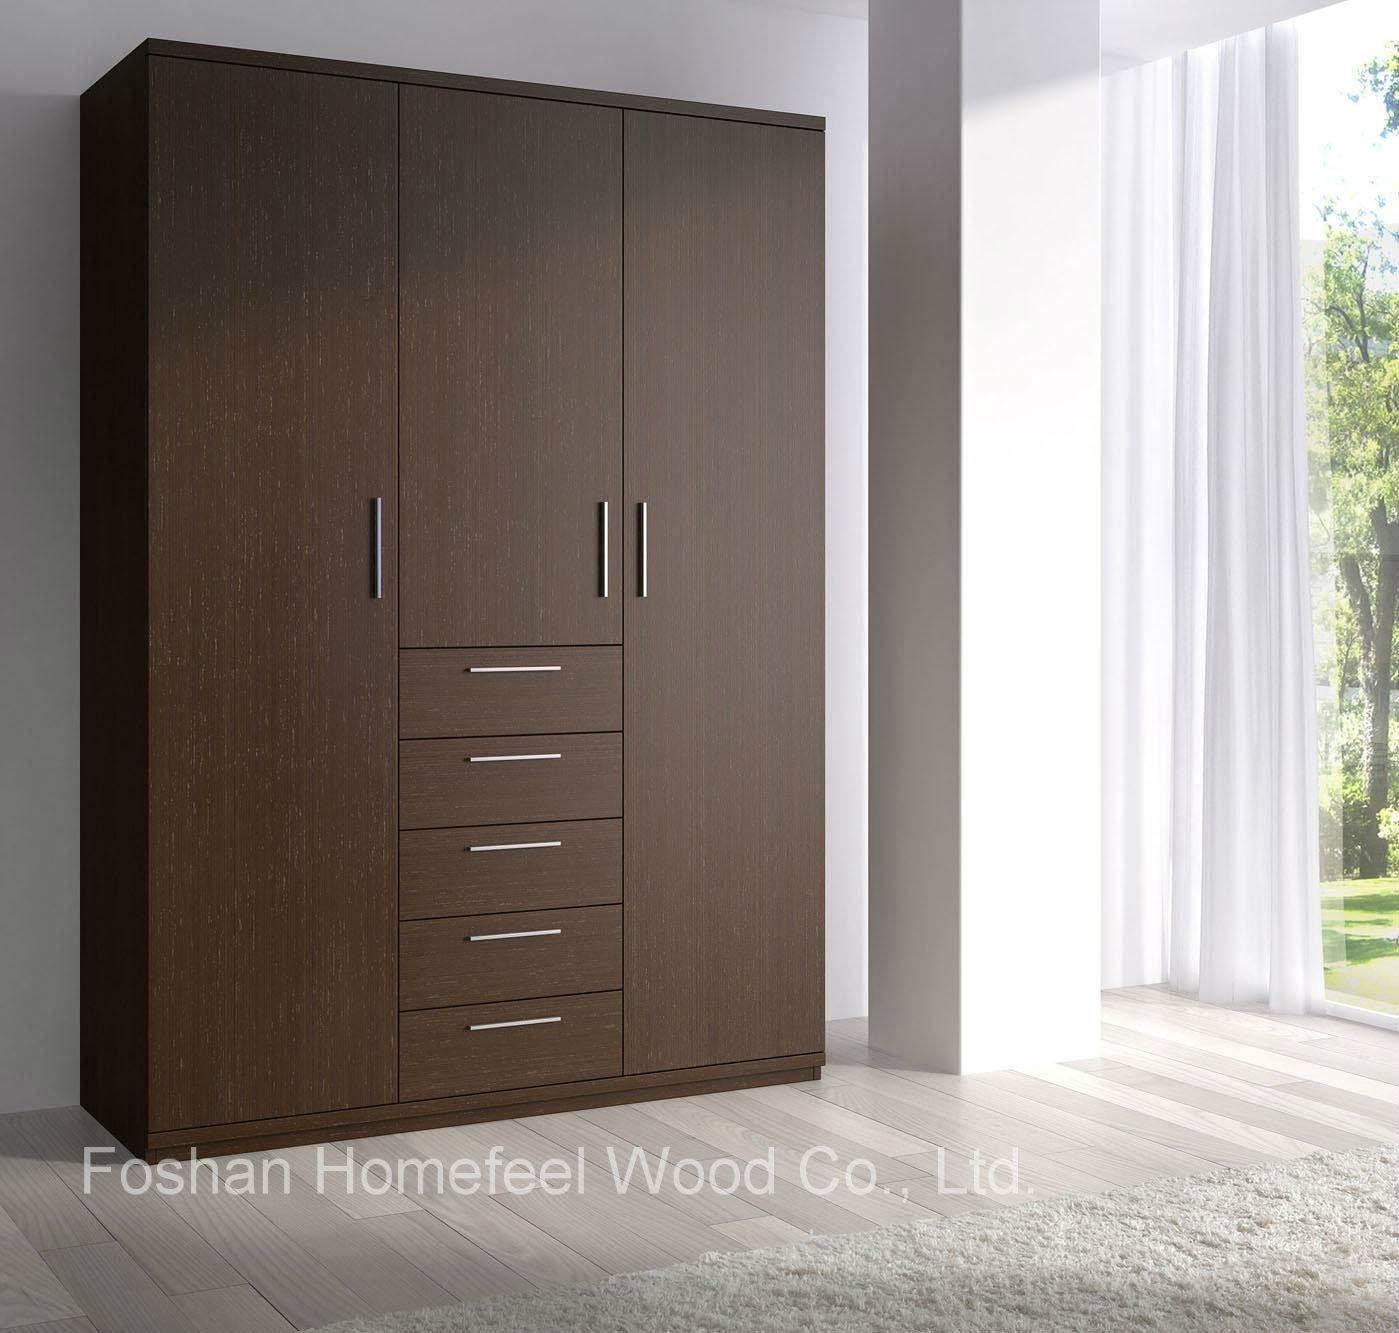 China Dark Brown Wooden Wardrobe With 3 Door Modern Furniture (Hf with regard to Dark Wood Wardrobe Doors (Image 8 of 30)